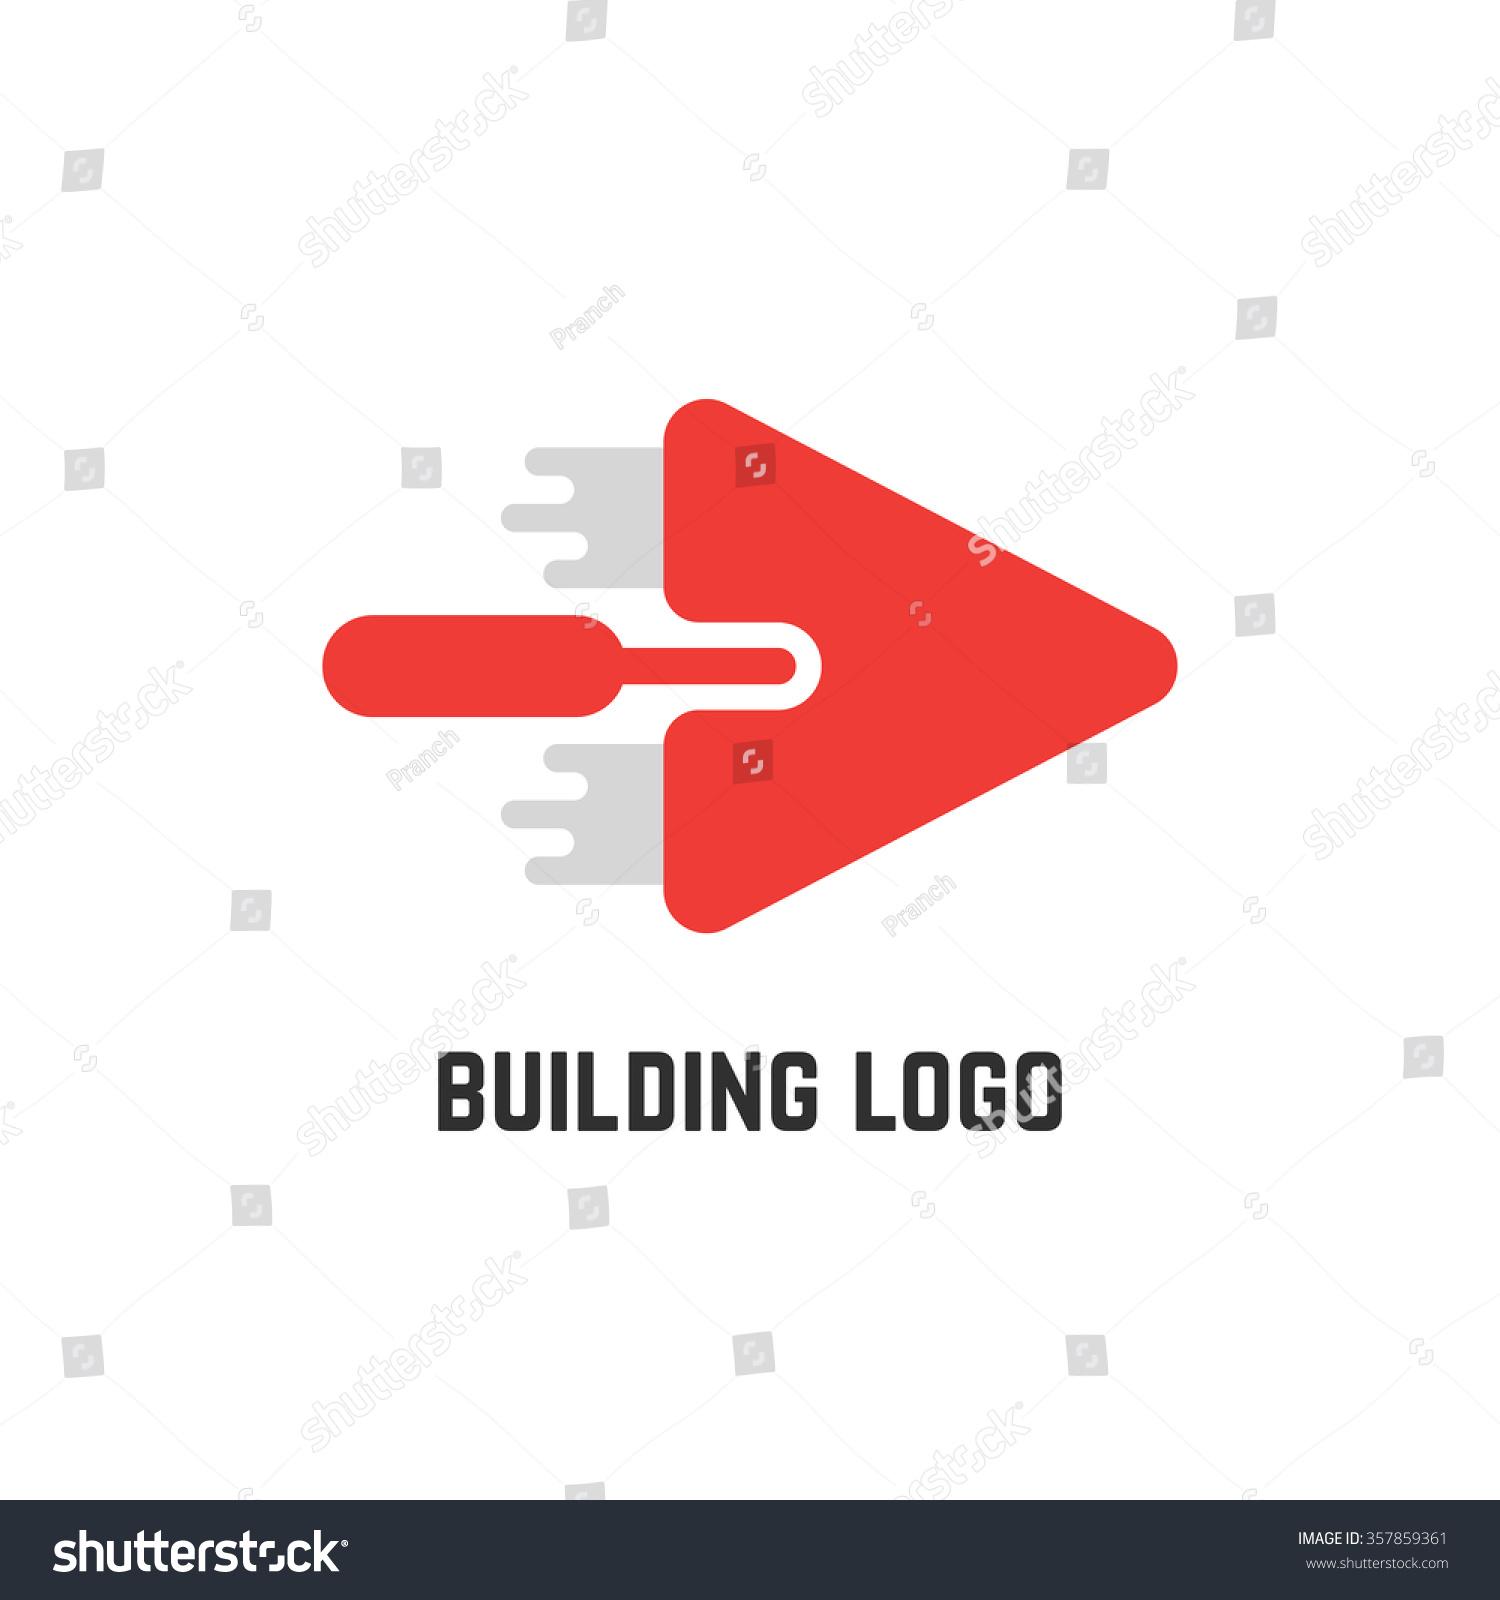 Masonry Trowel Logo : Building logo red trowel concept implement stock vector